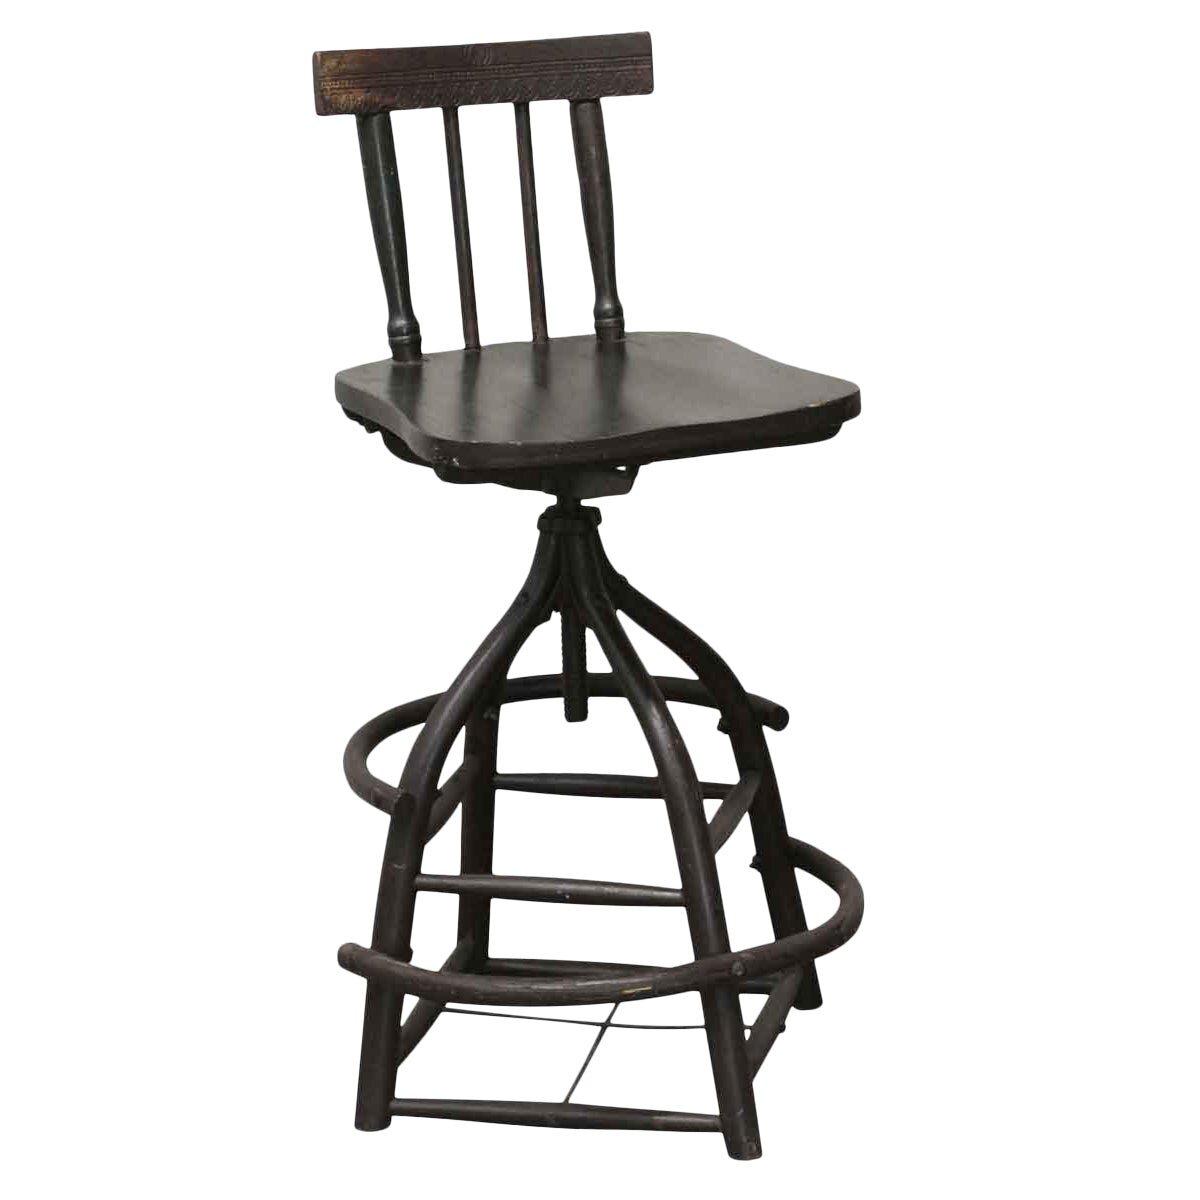 late-20th-century-vintage-wooden-stool-7102.jpeg